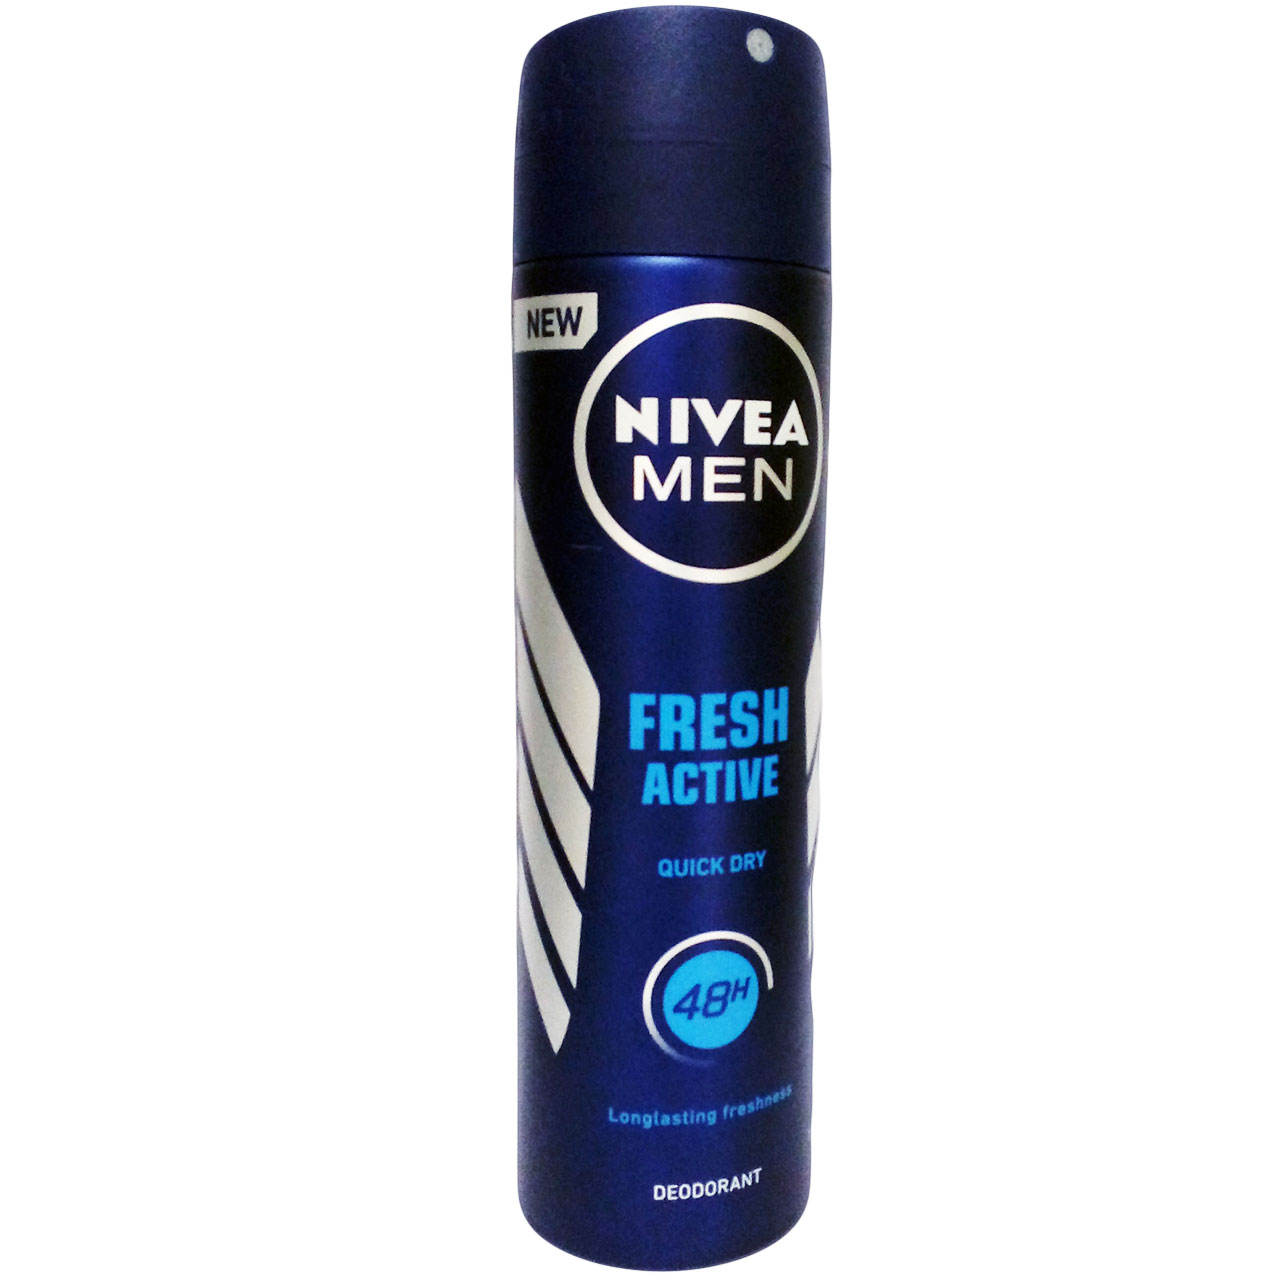 اسپری مردانه نیوآ مدل Fresh Active حجم 150 میلی لیتر -  - 1